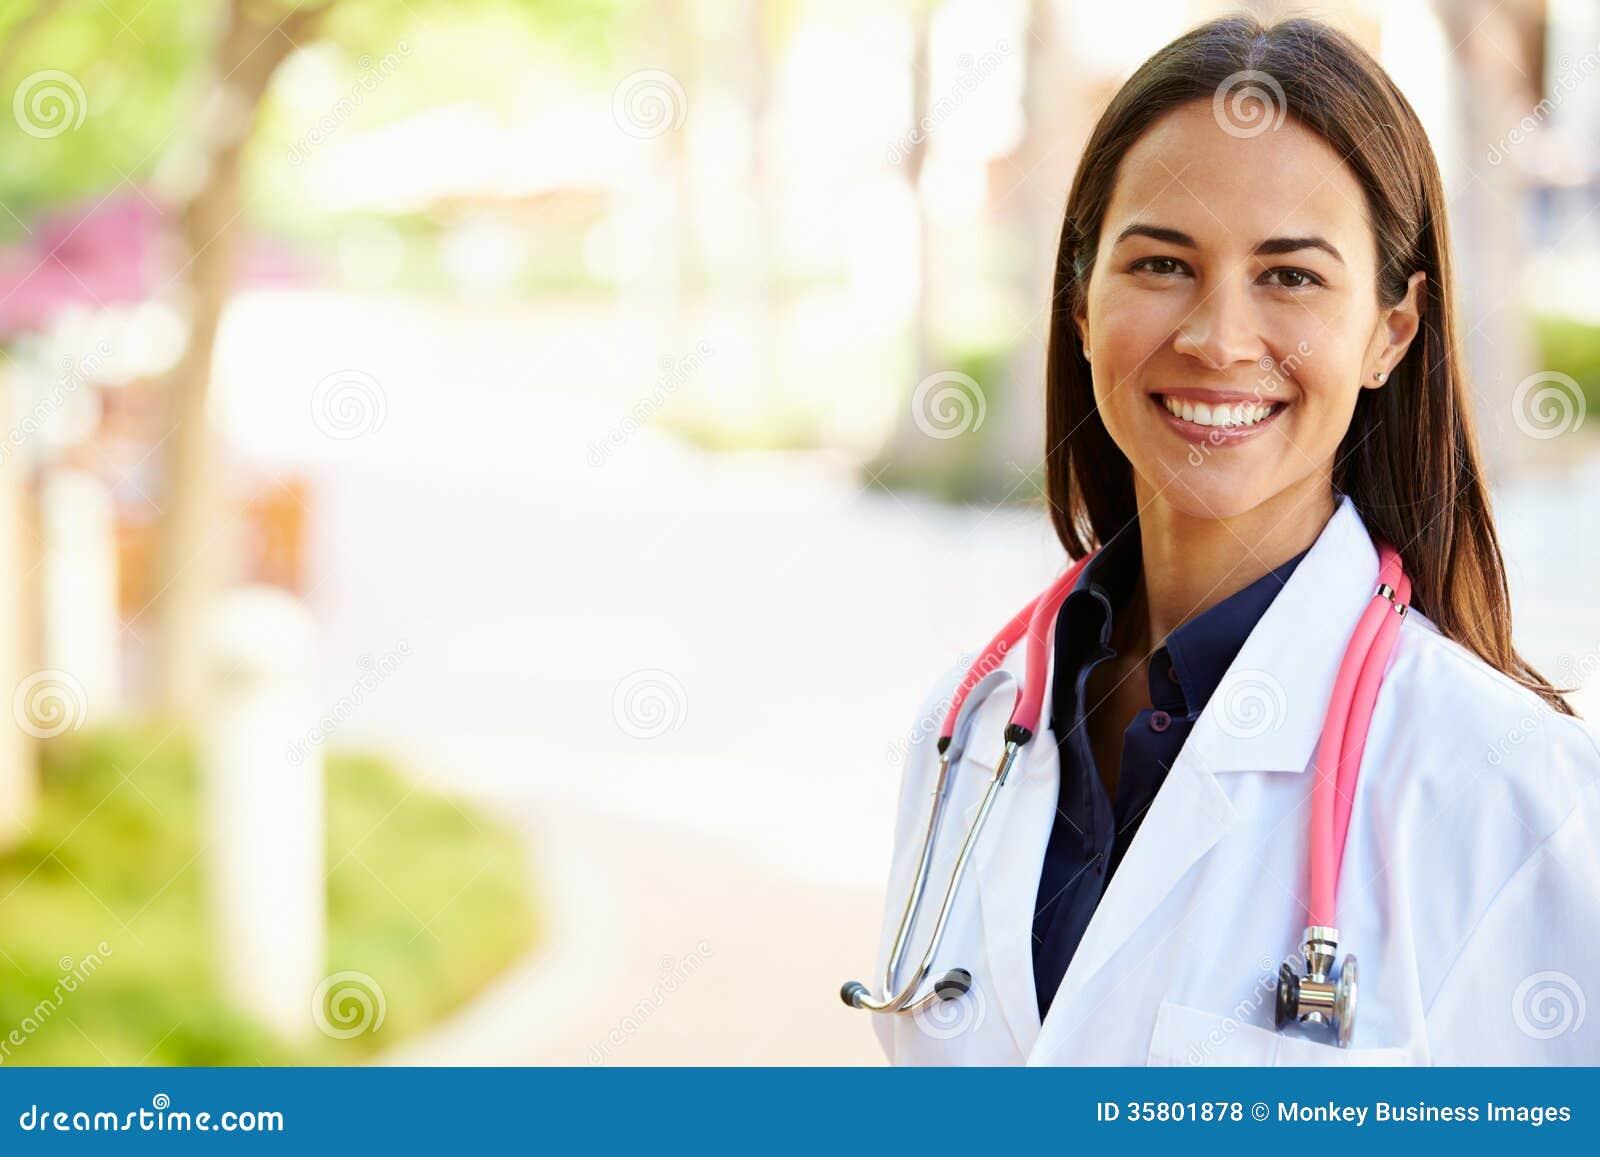 Outdoor Portrait Of Female Doctor